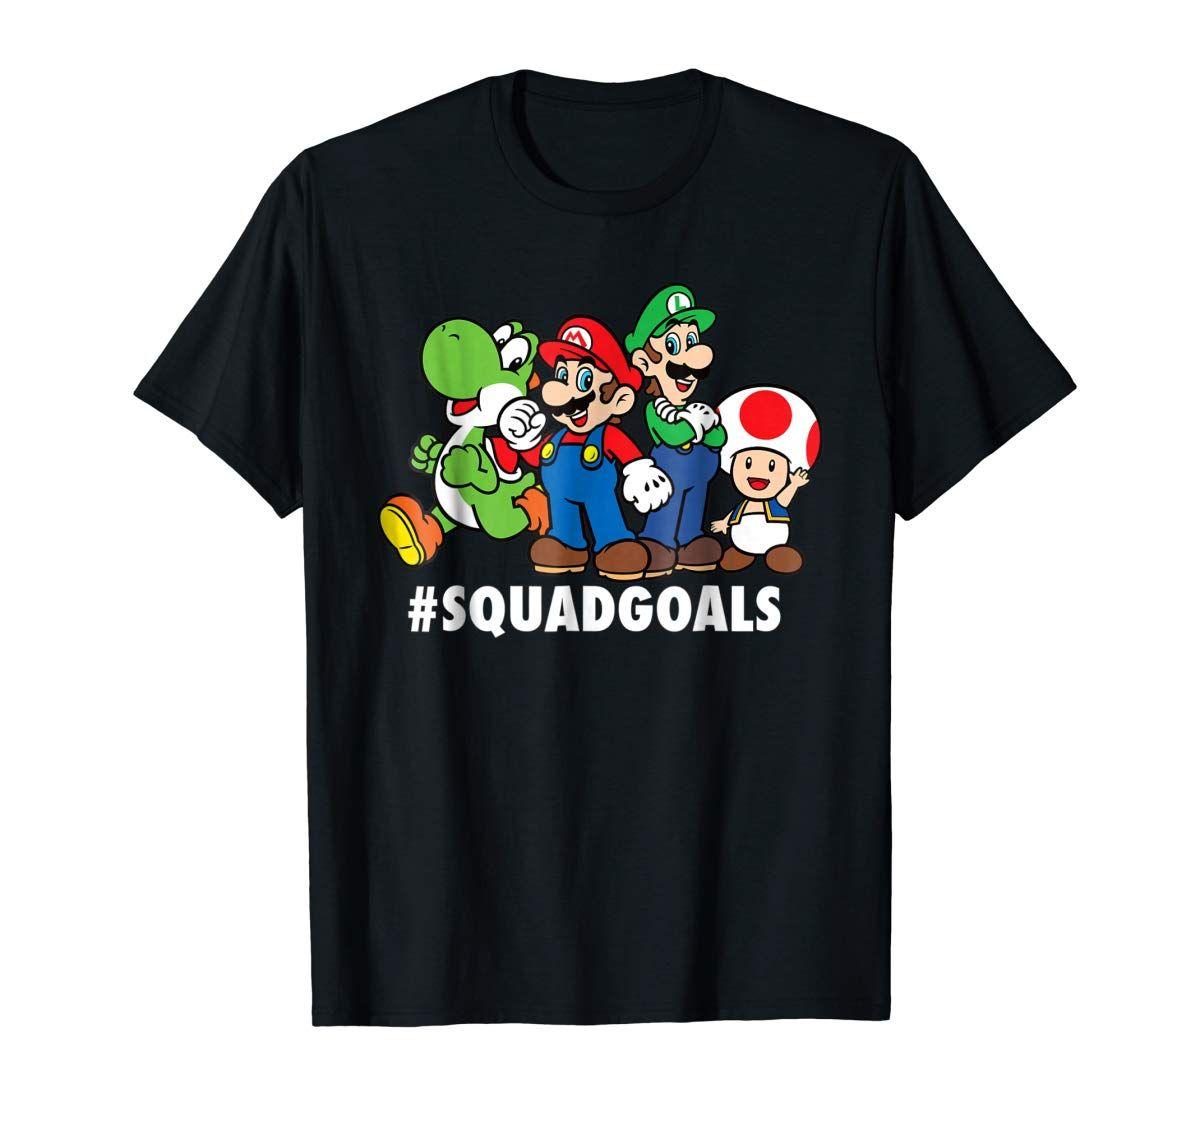 Nintendo Super Mario Luigi Yoshi Toad Squadgoals Men S T Shirt Super Mario And Luigi Mens Tshirts Super Mario [ 1121 x 1200 Pixel ]